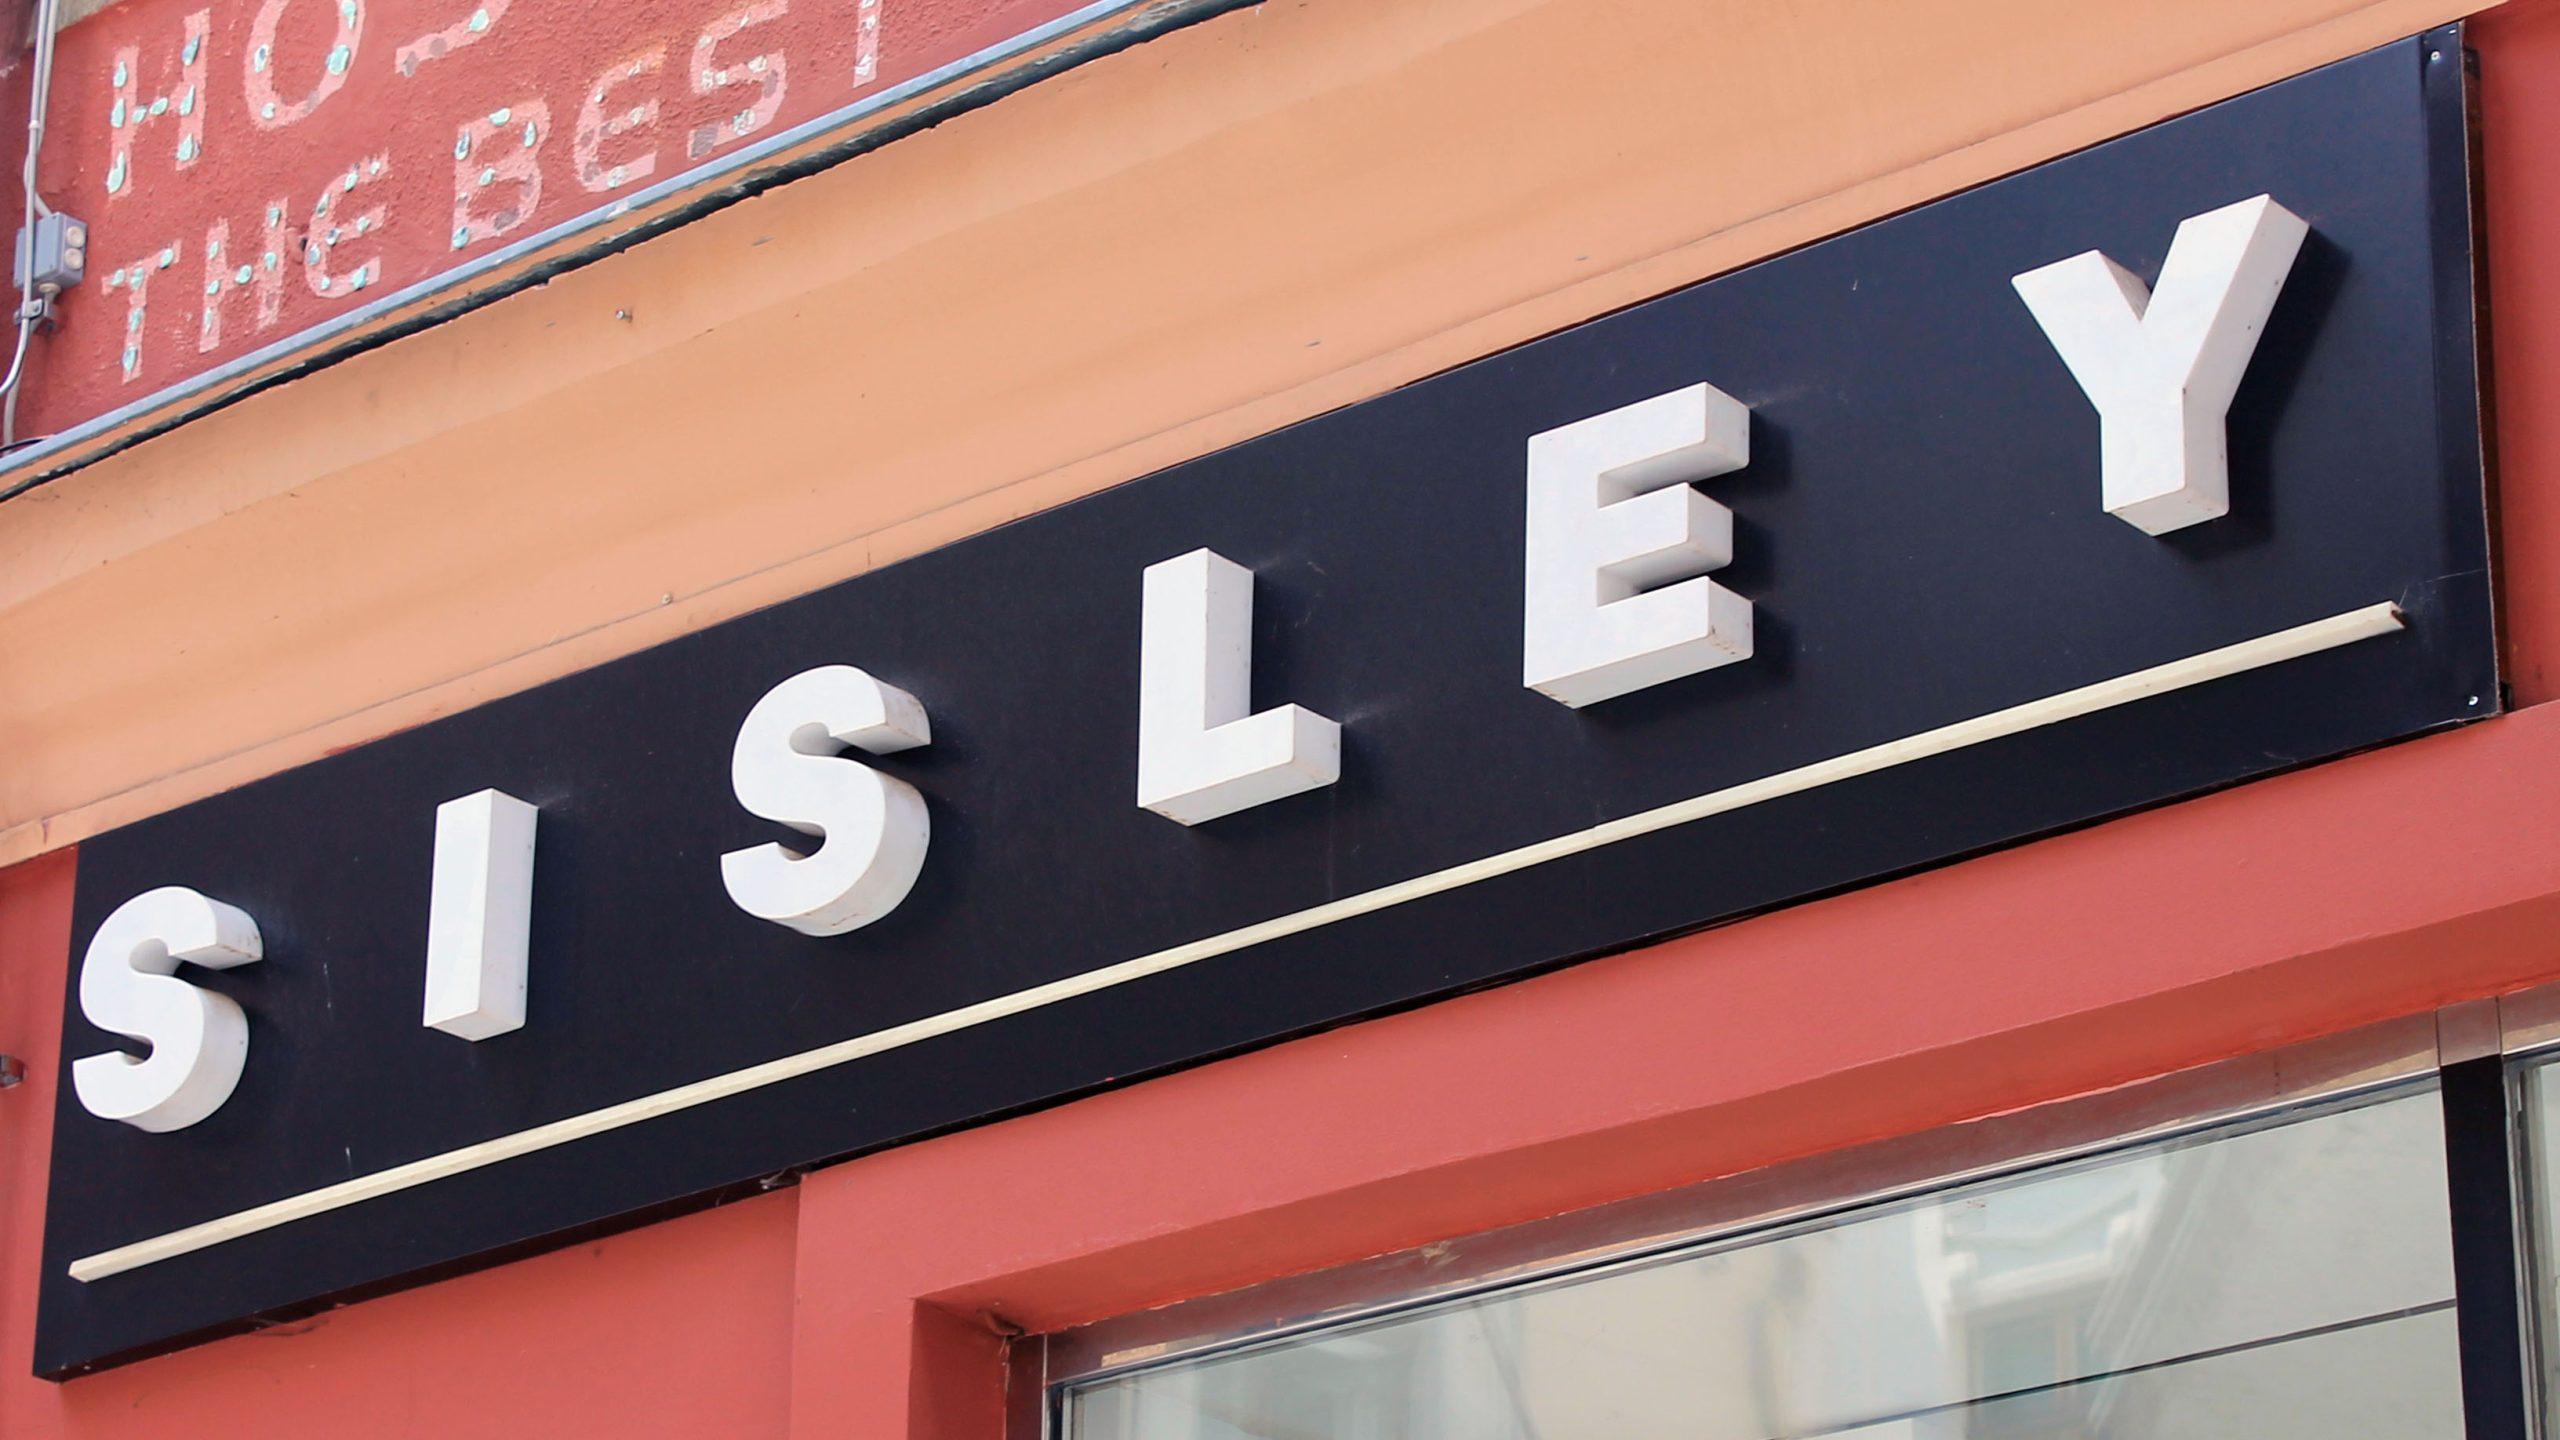 Sisley svjetleca reklama